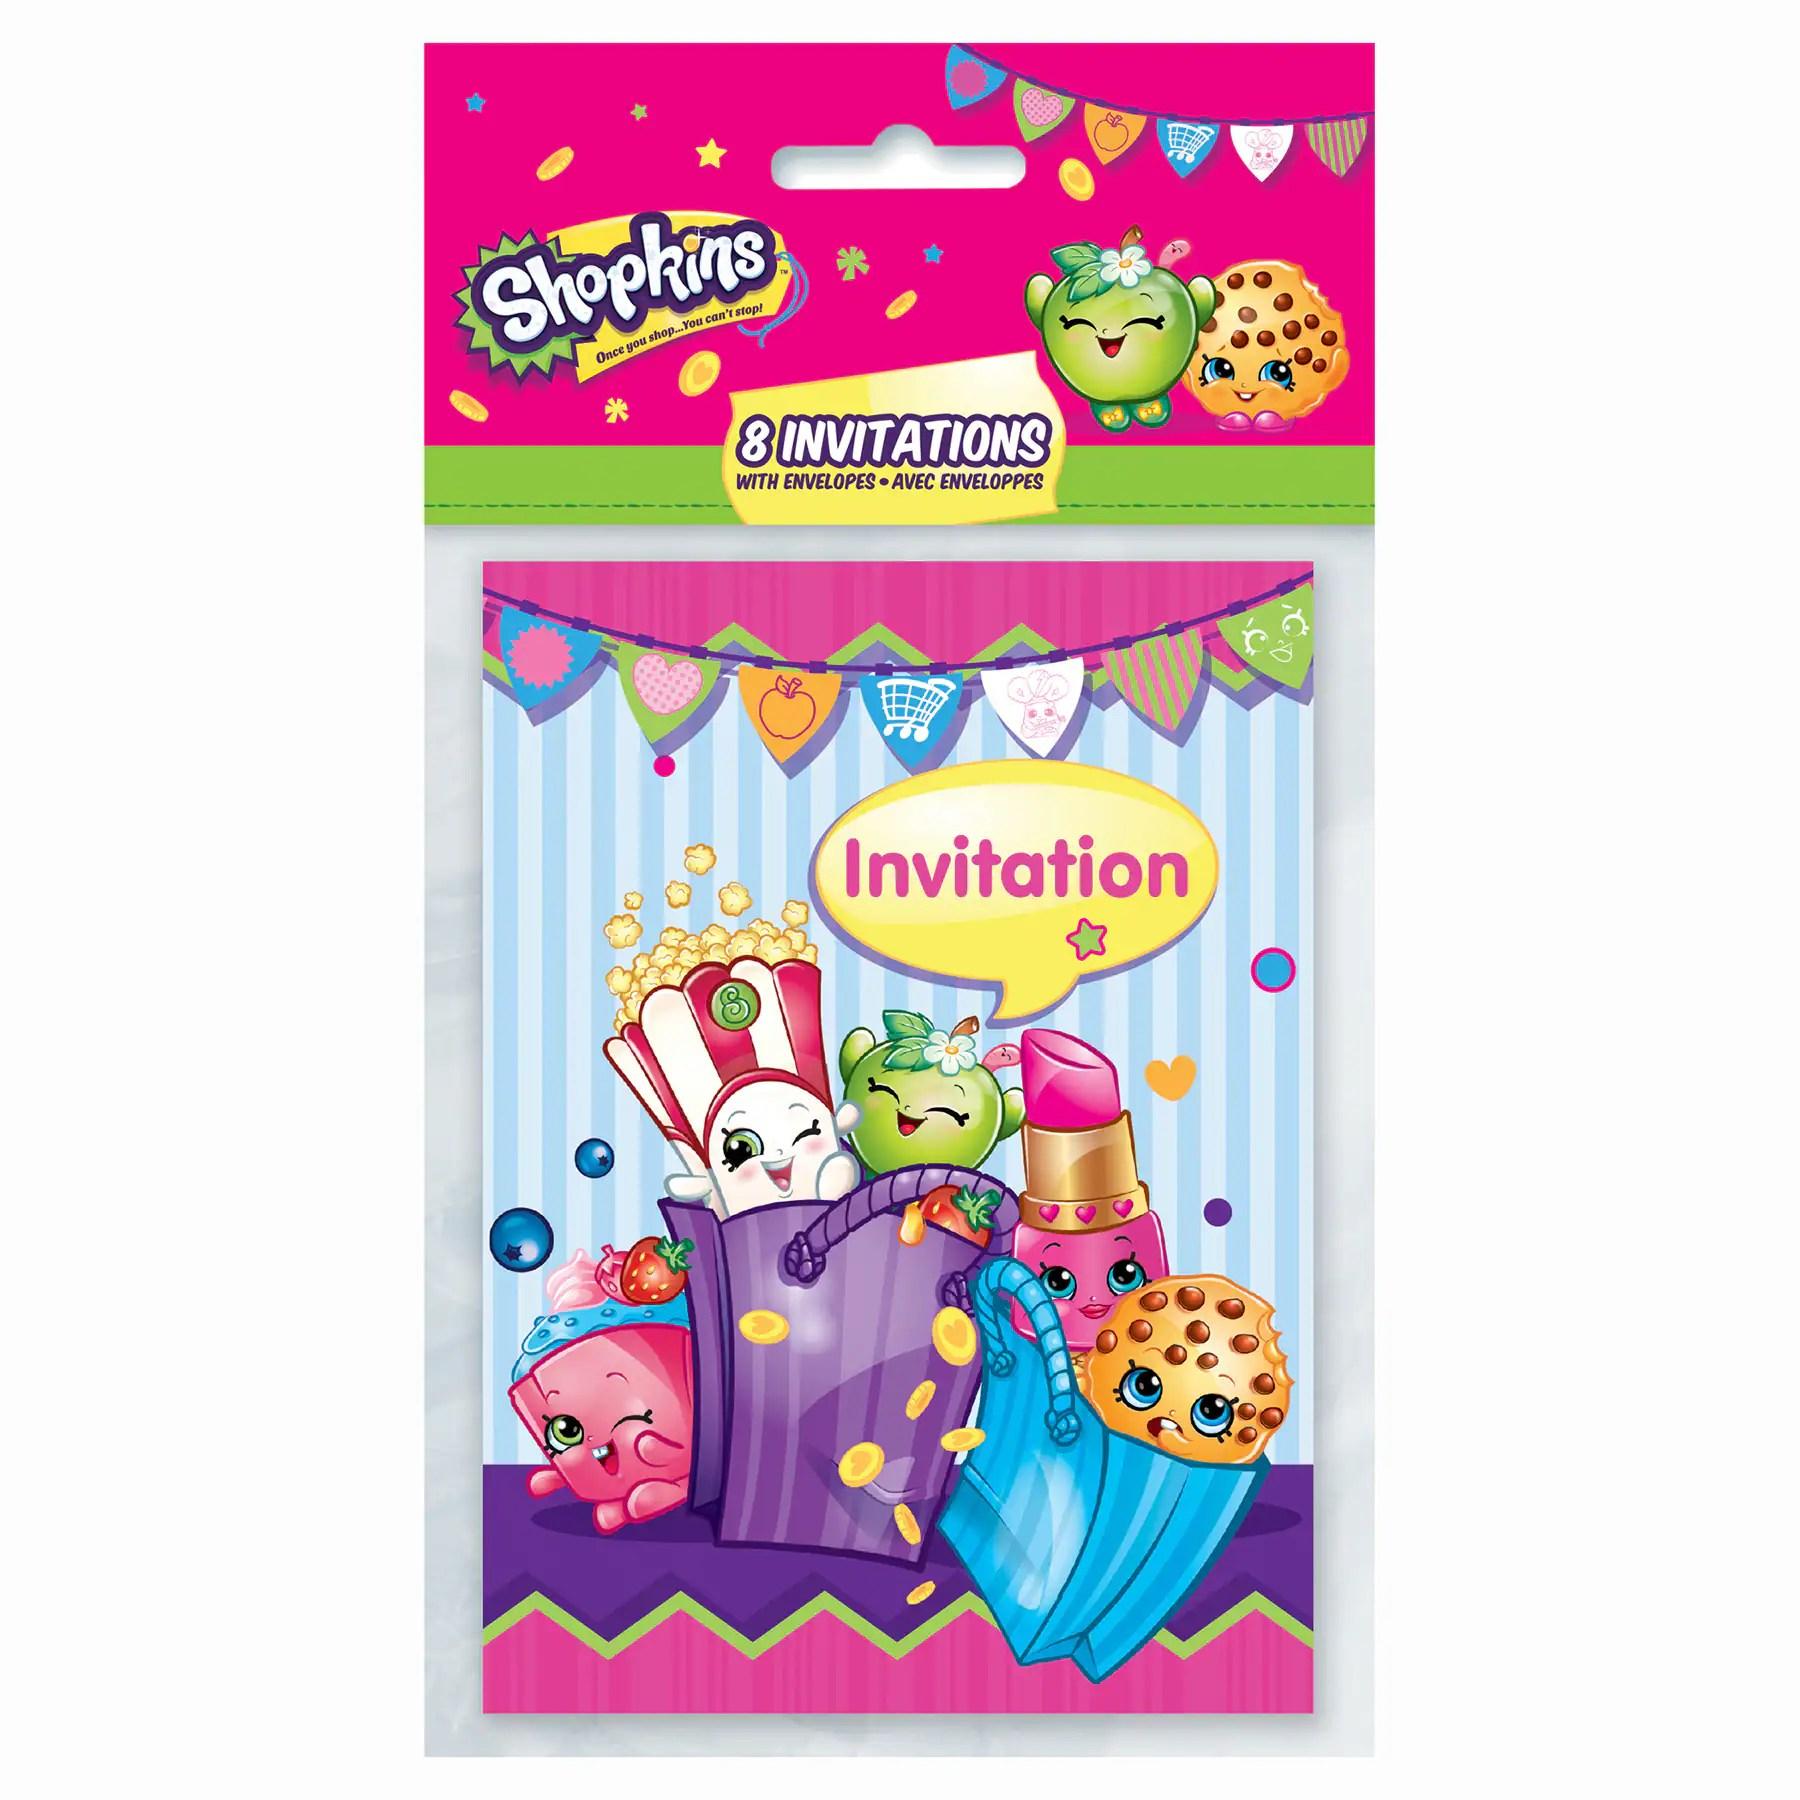 shopkins invitations 8ct